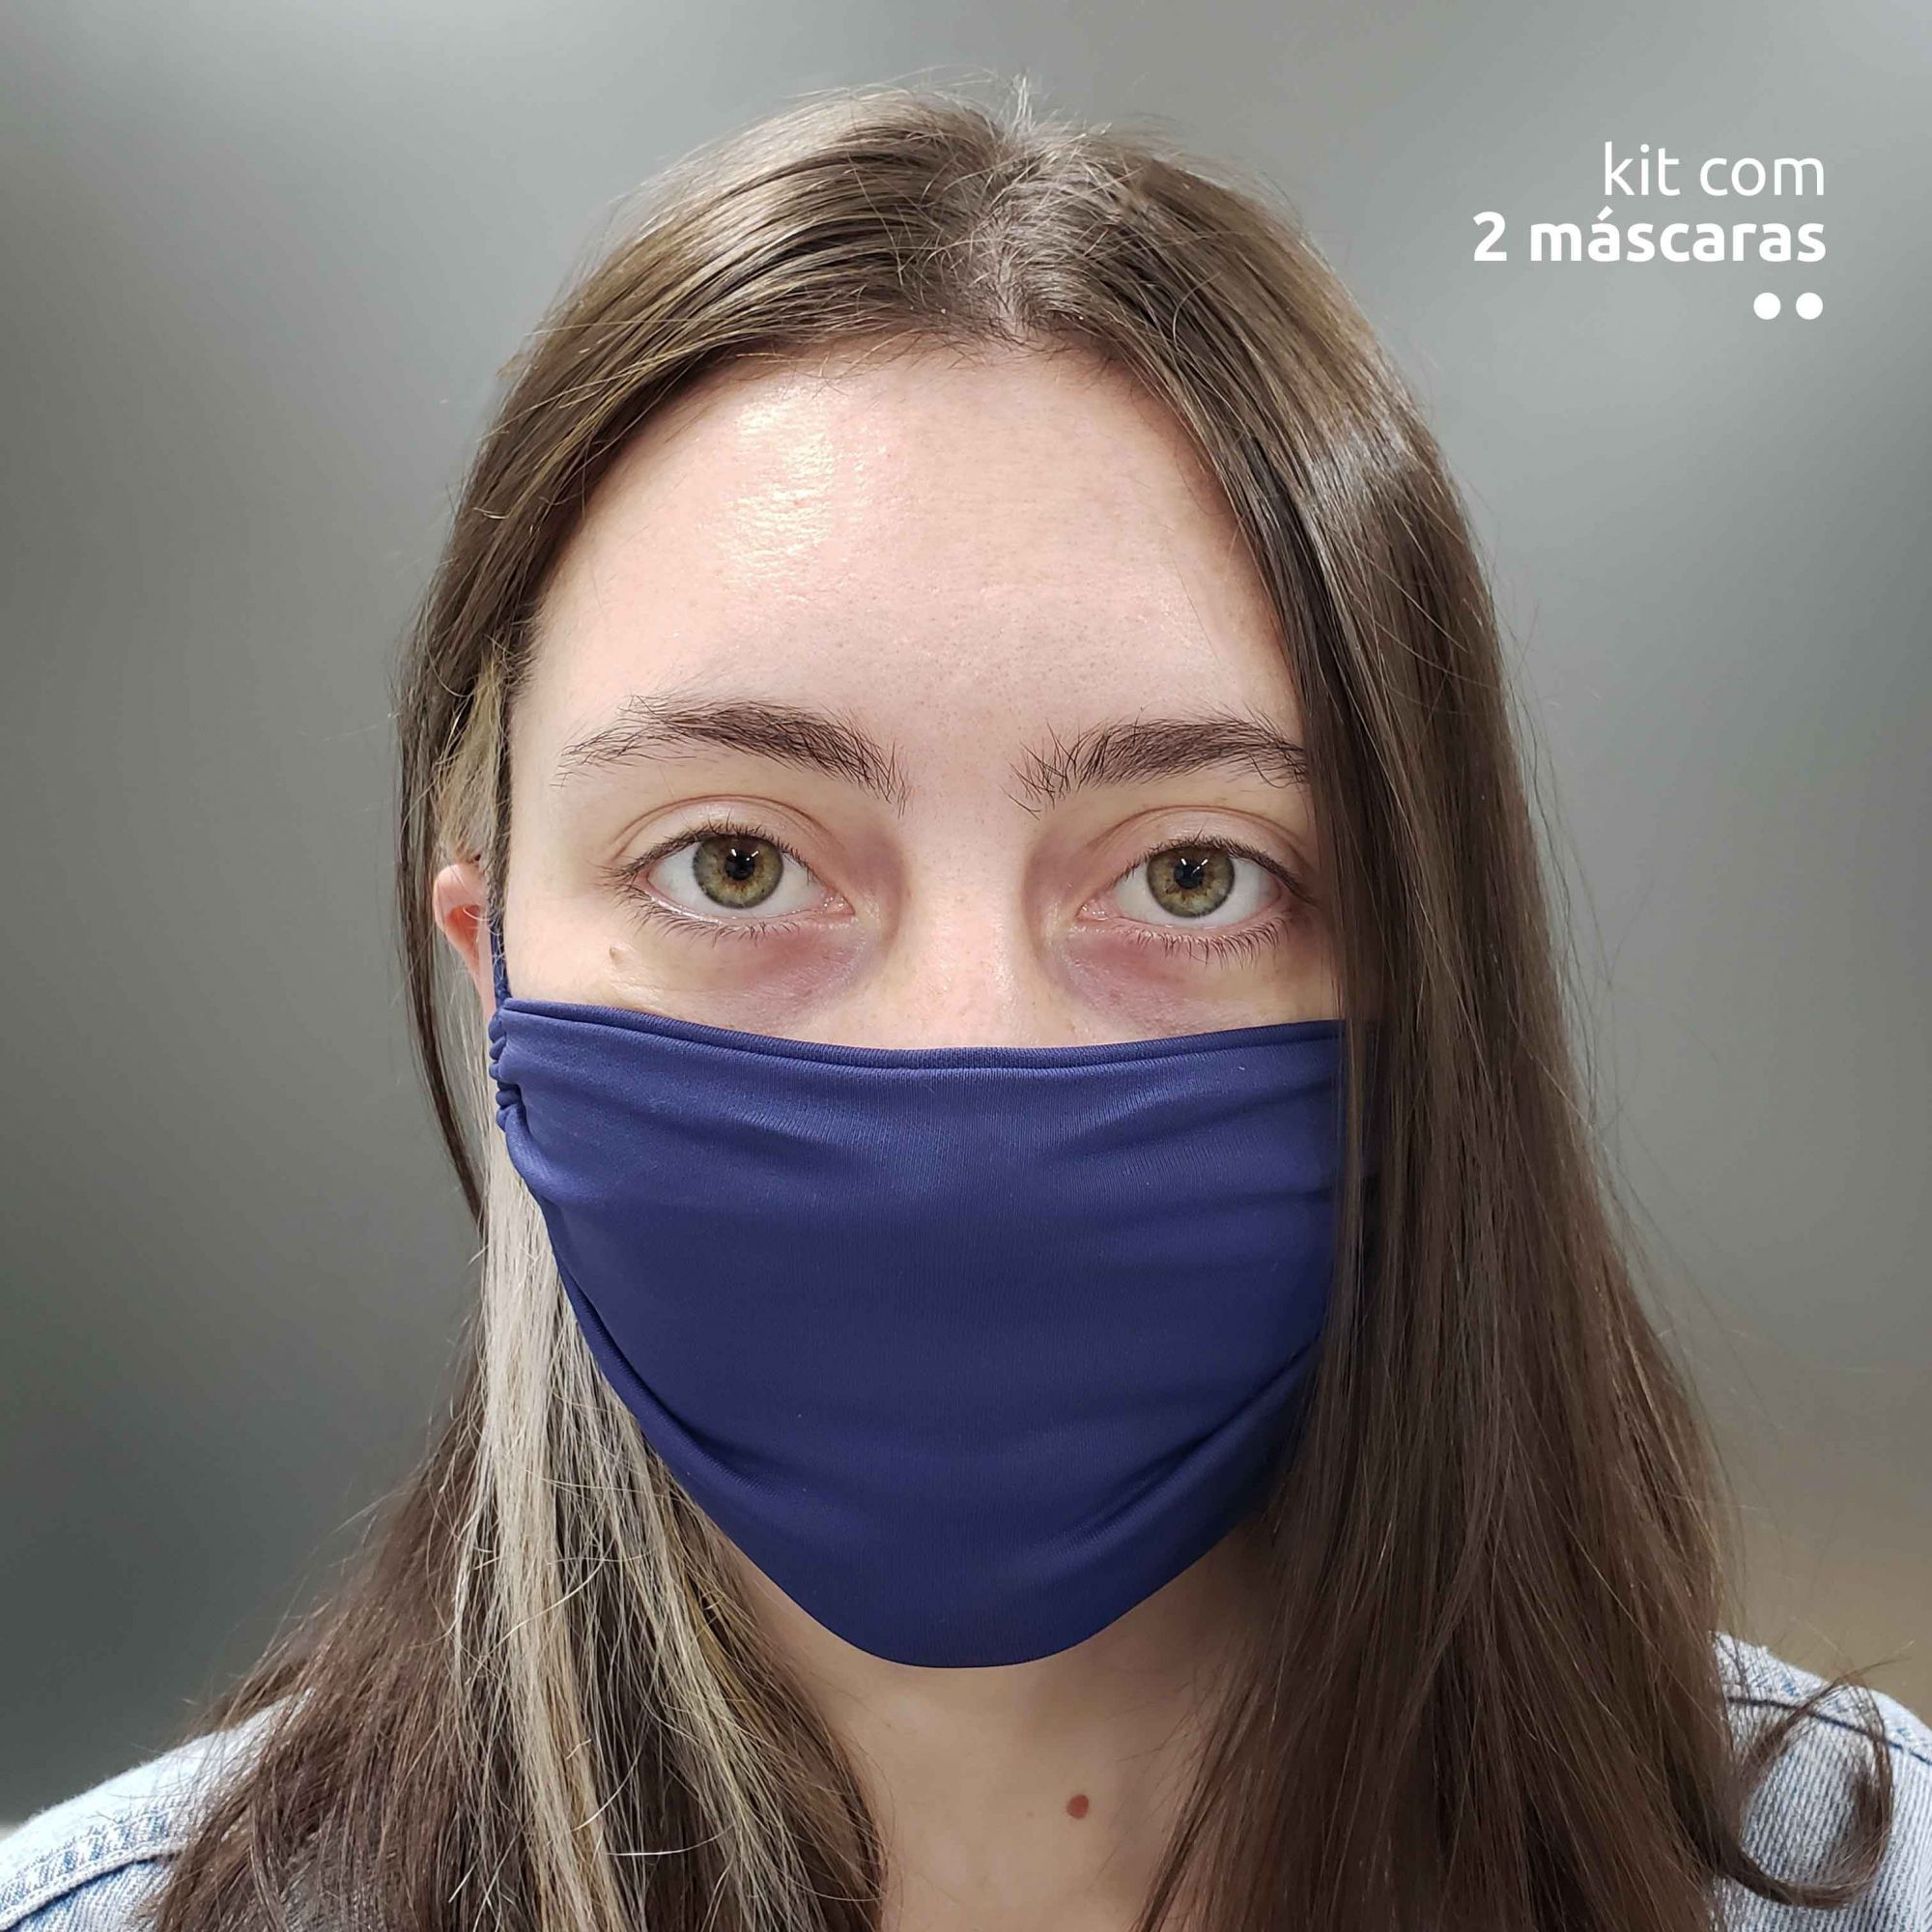 KIT 2 máscaras tenológicas - Azul Marinho